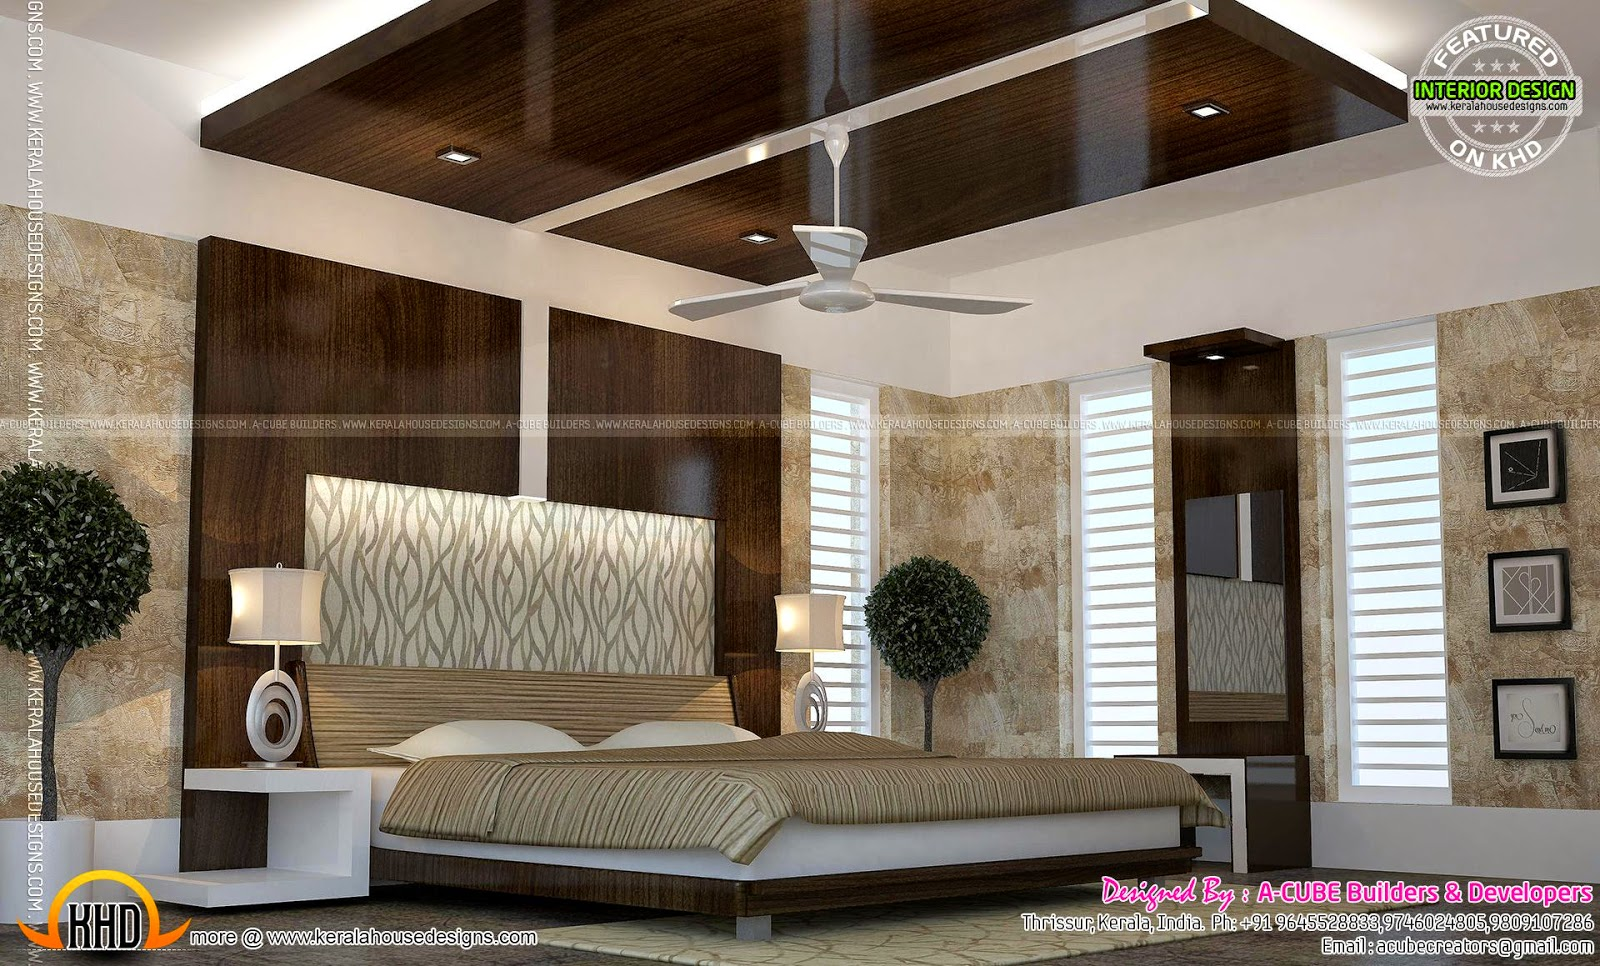 Kerala interior design ideas - Kerala home design and ...